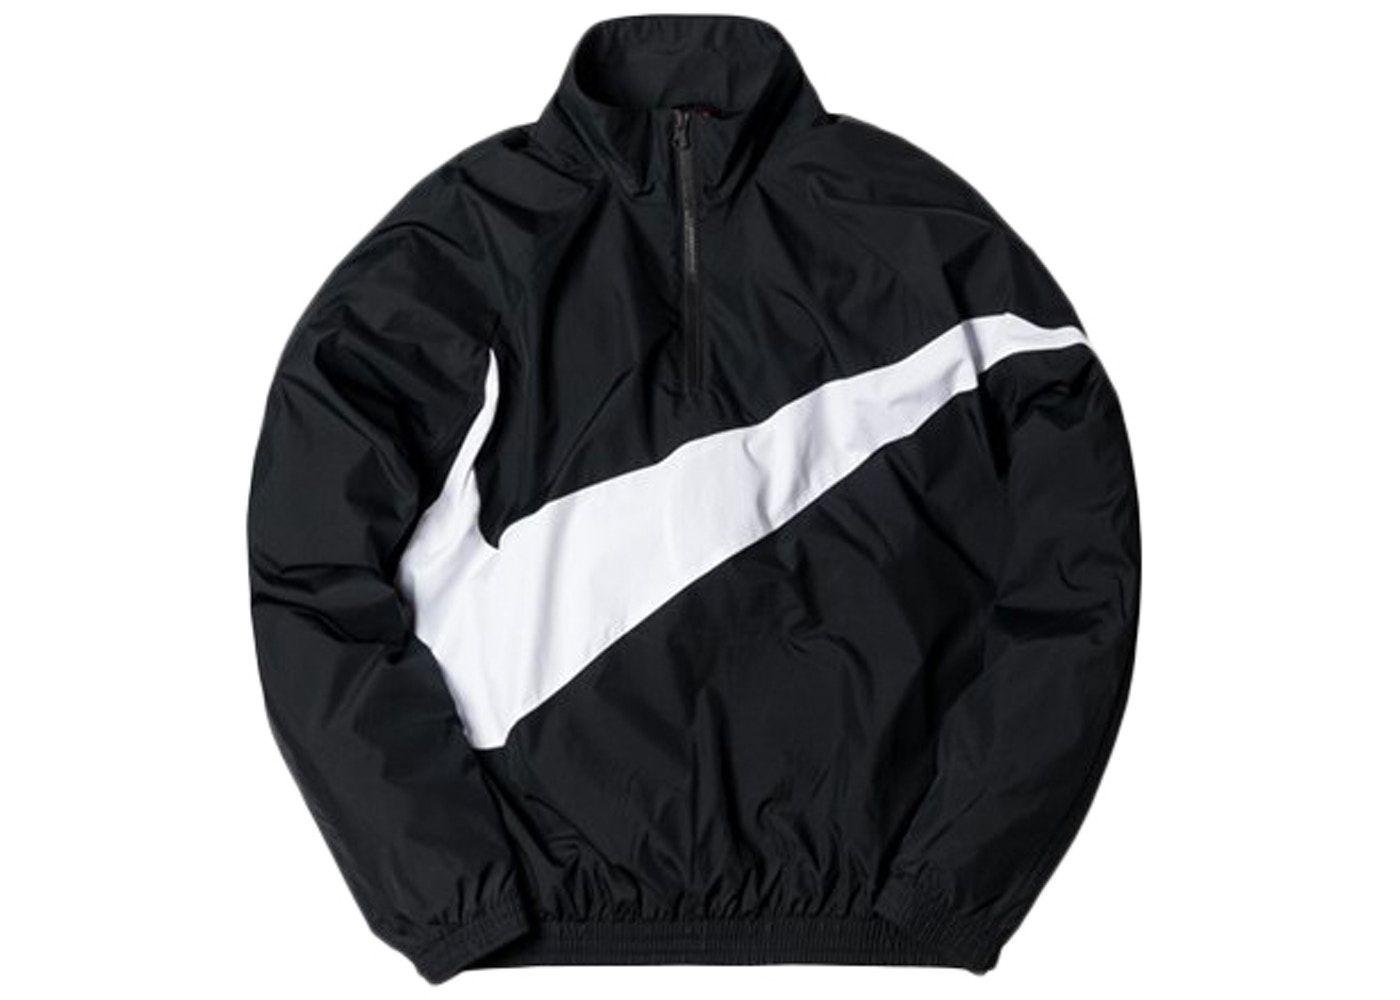 Kith Nike Big Swoosh Quarter Zip Black Fw17 Nike Outfits Windbreaker Jacket Mens Jordan Outfits For Girls